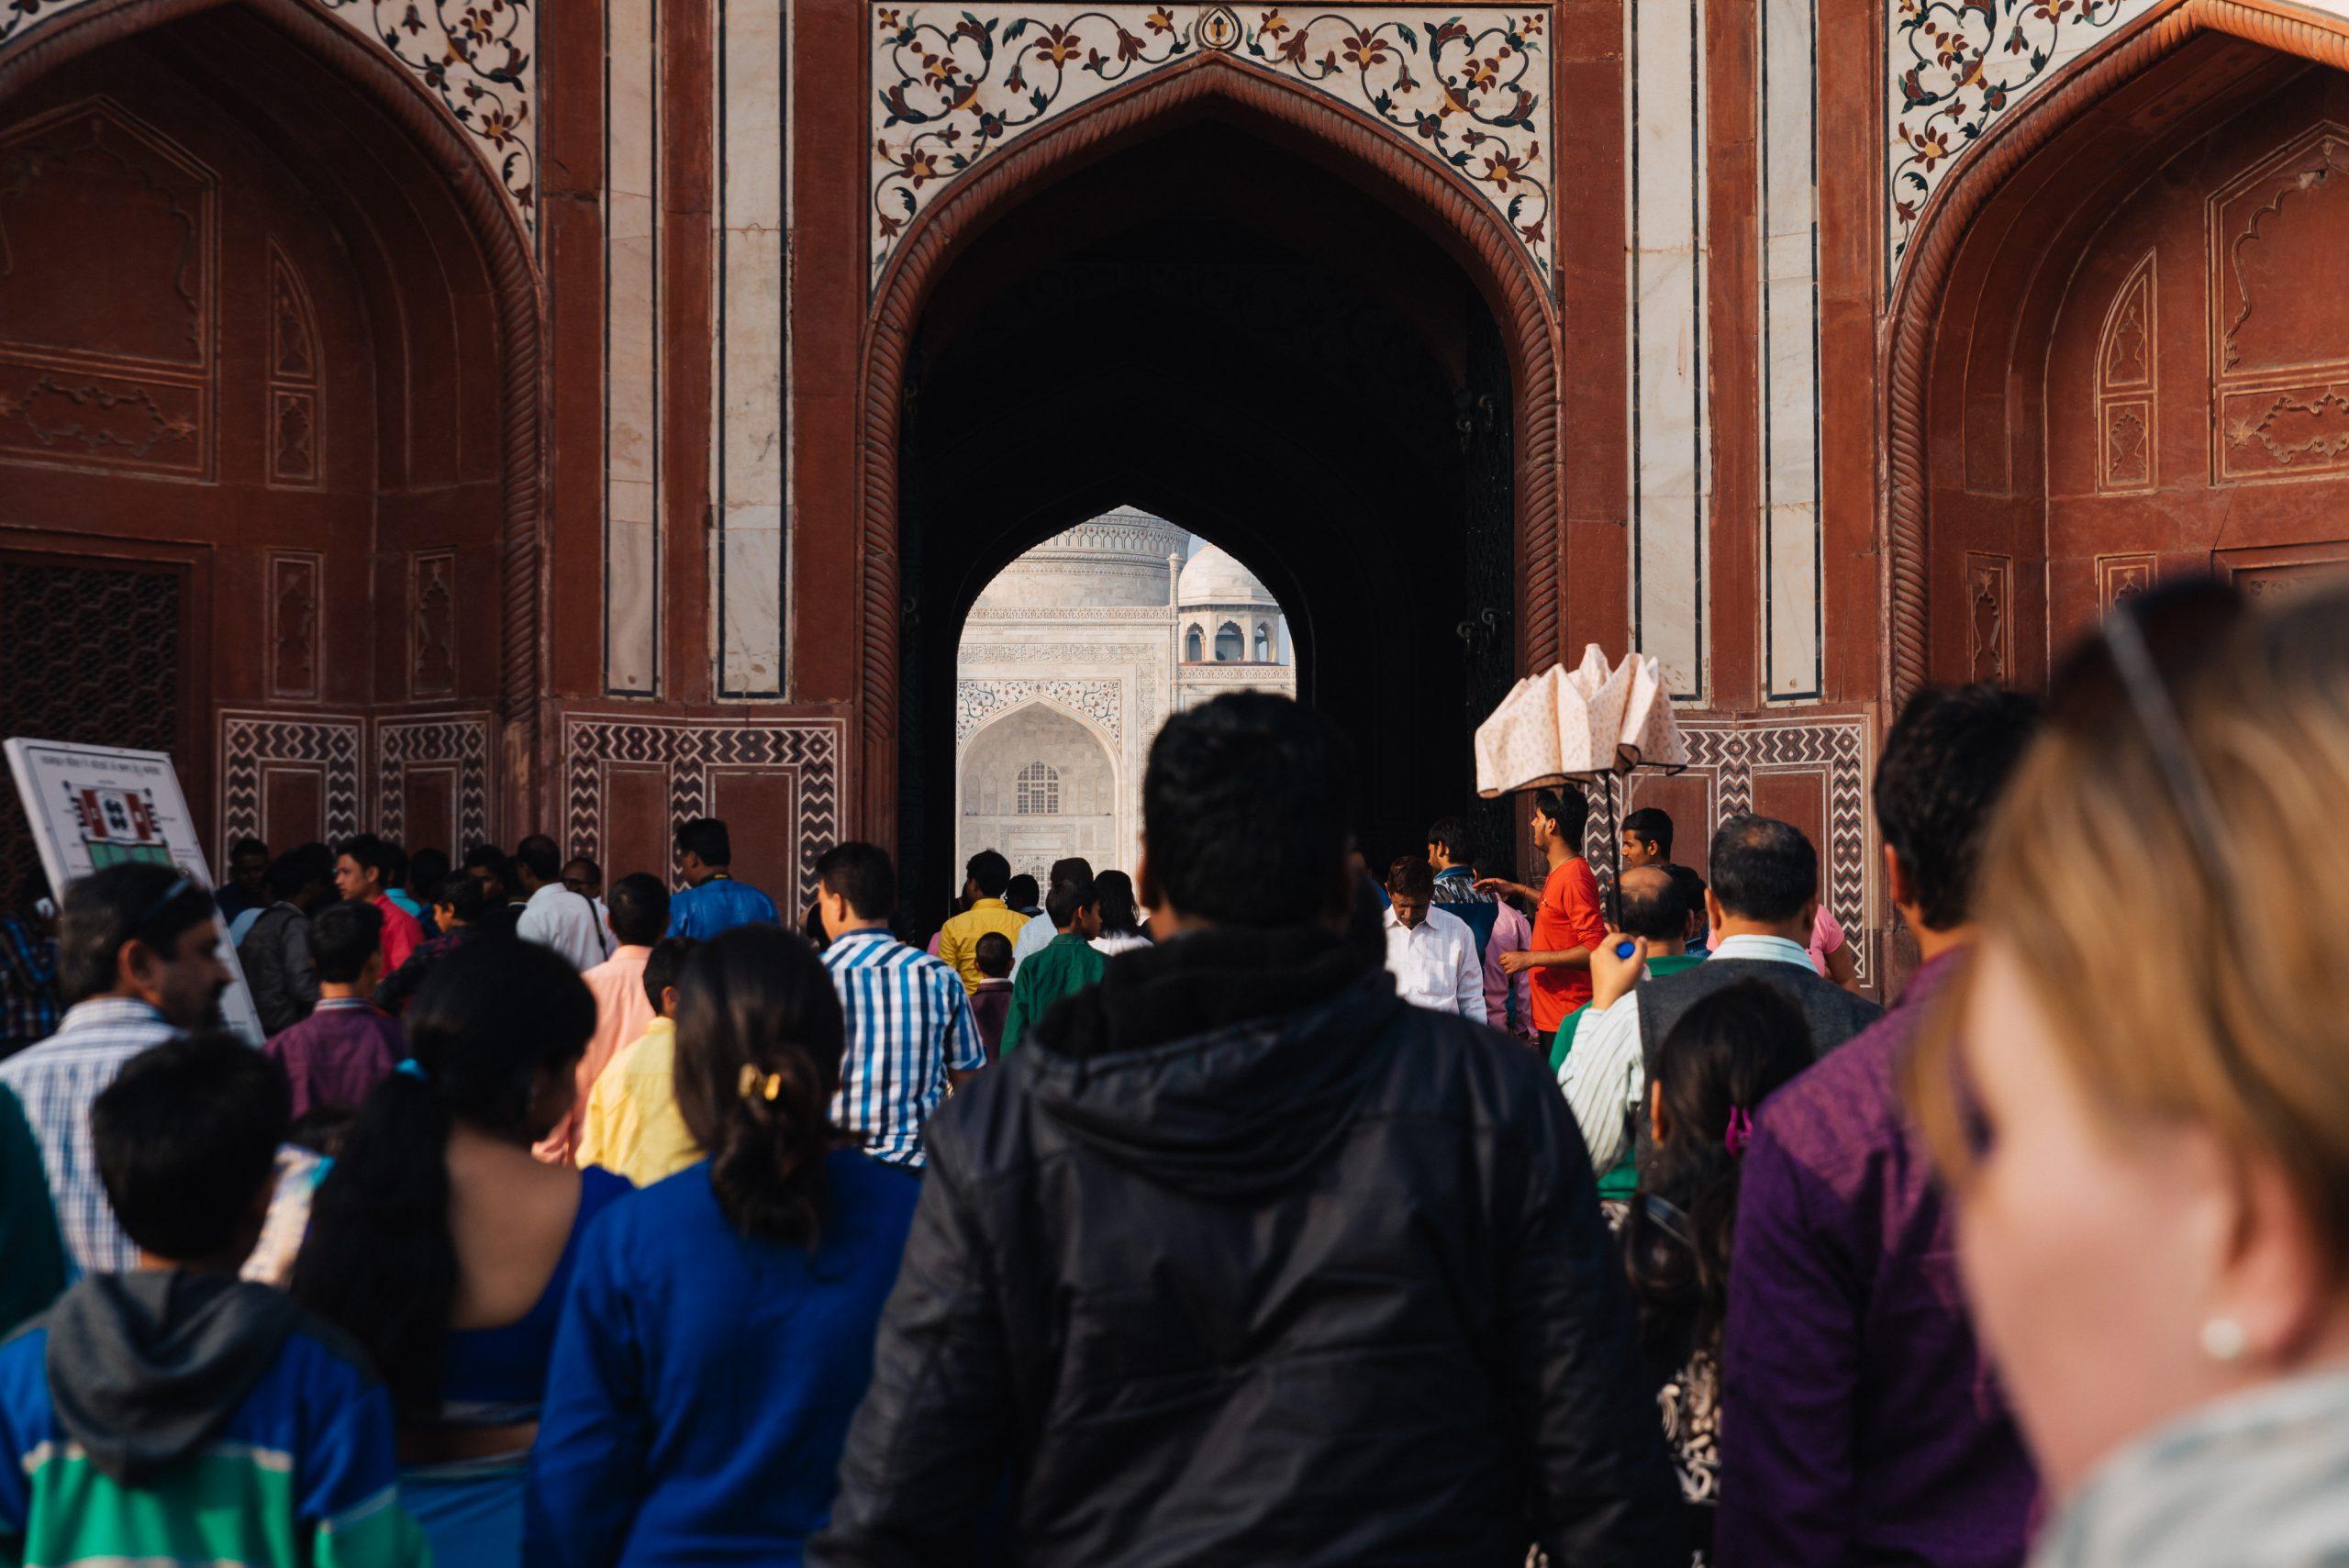 Tagesausflug zum Taj Mahal